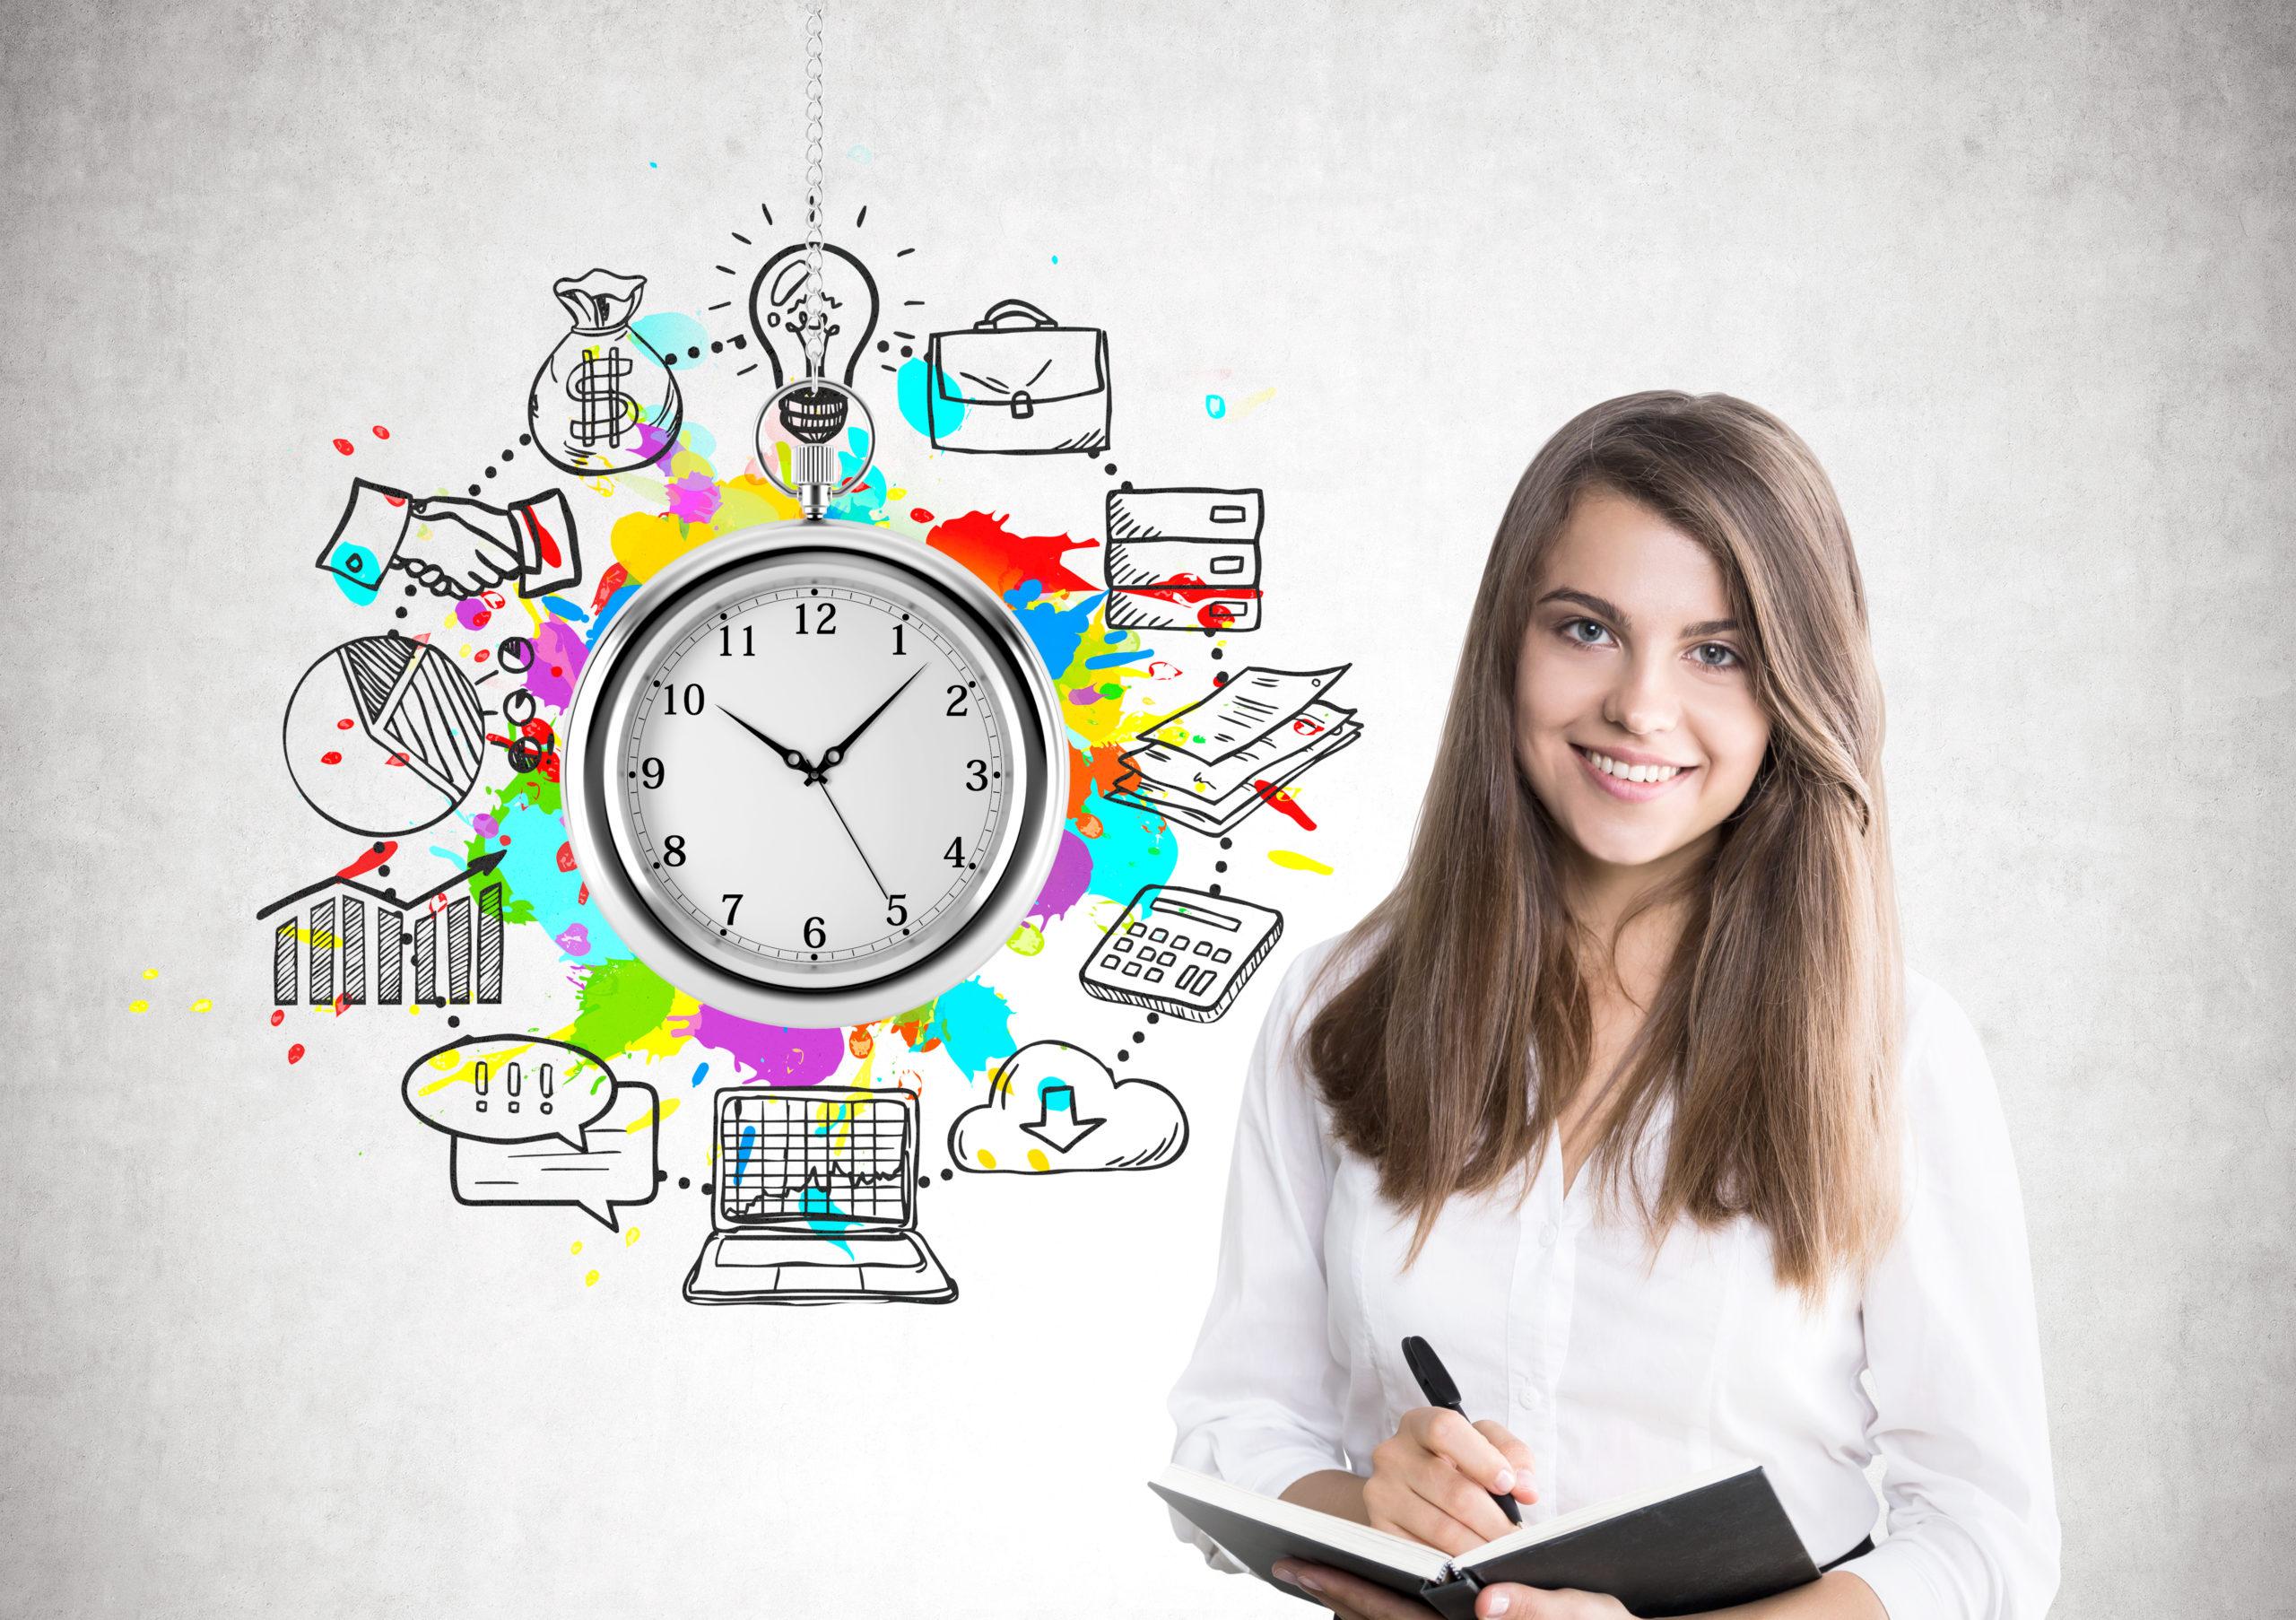 Gutes Zeitmanagement beugt Stress vor